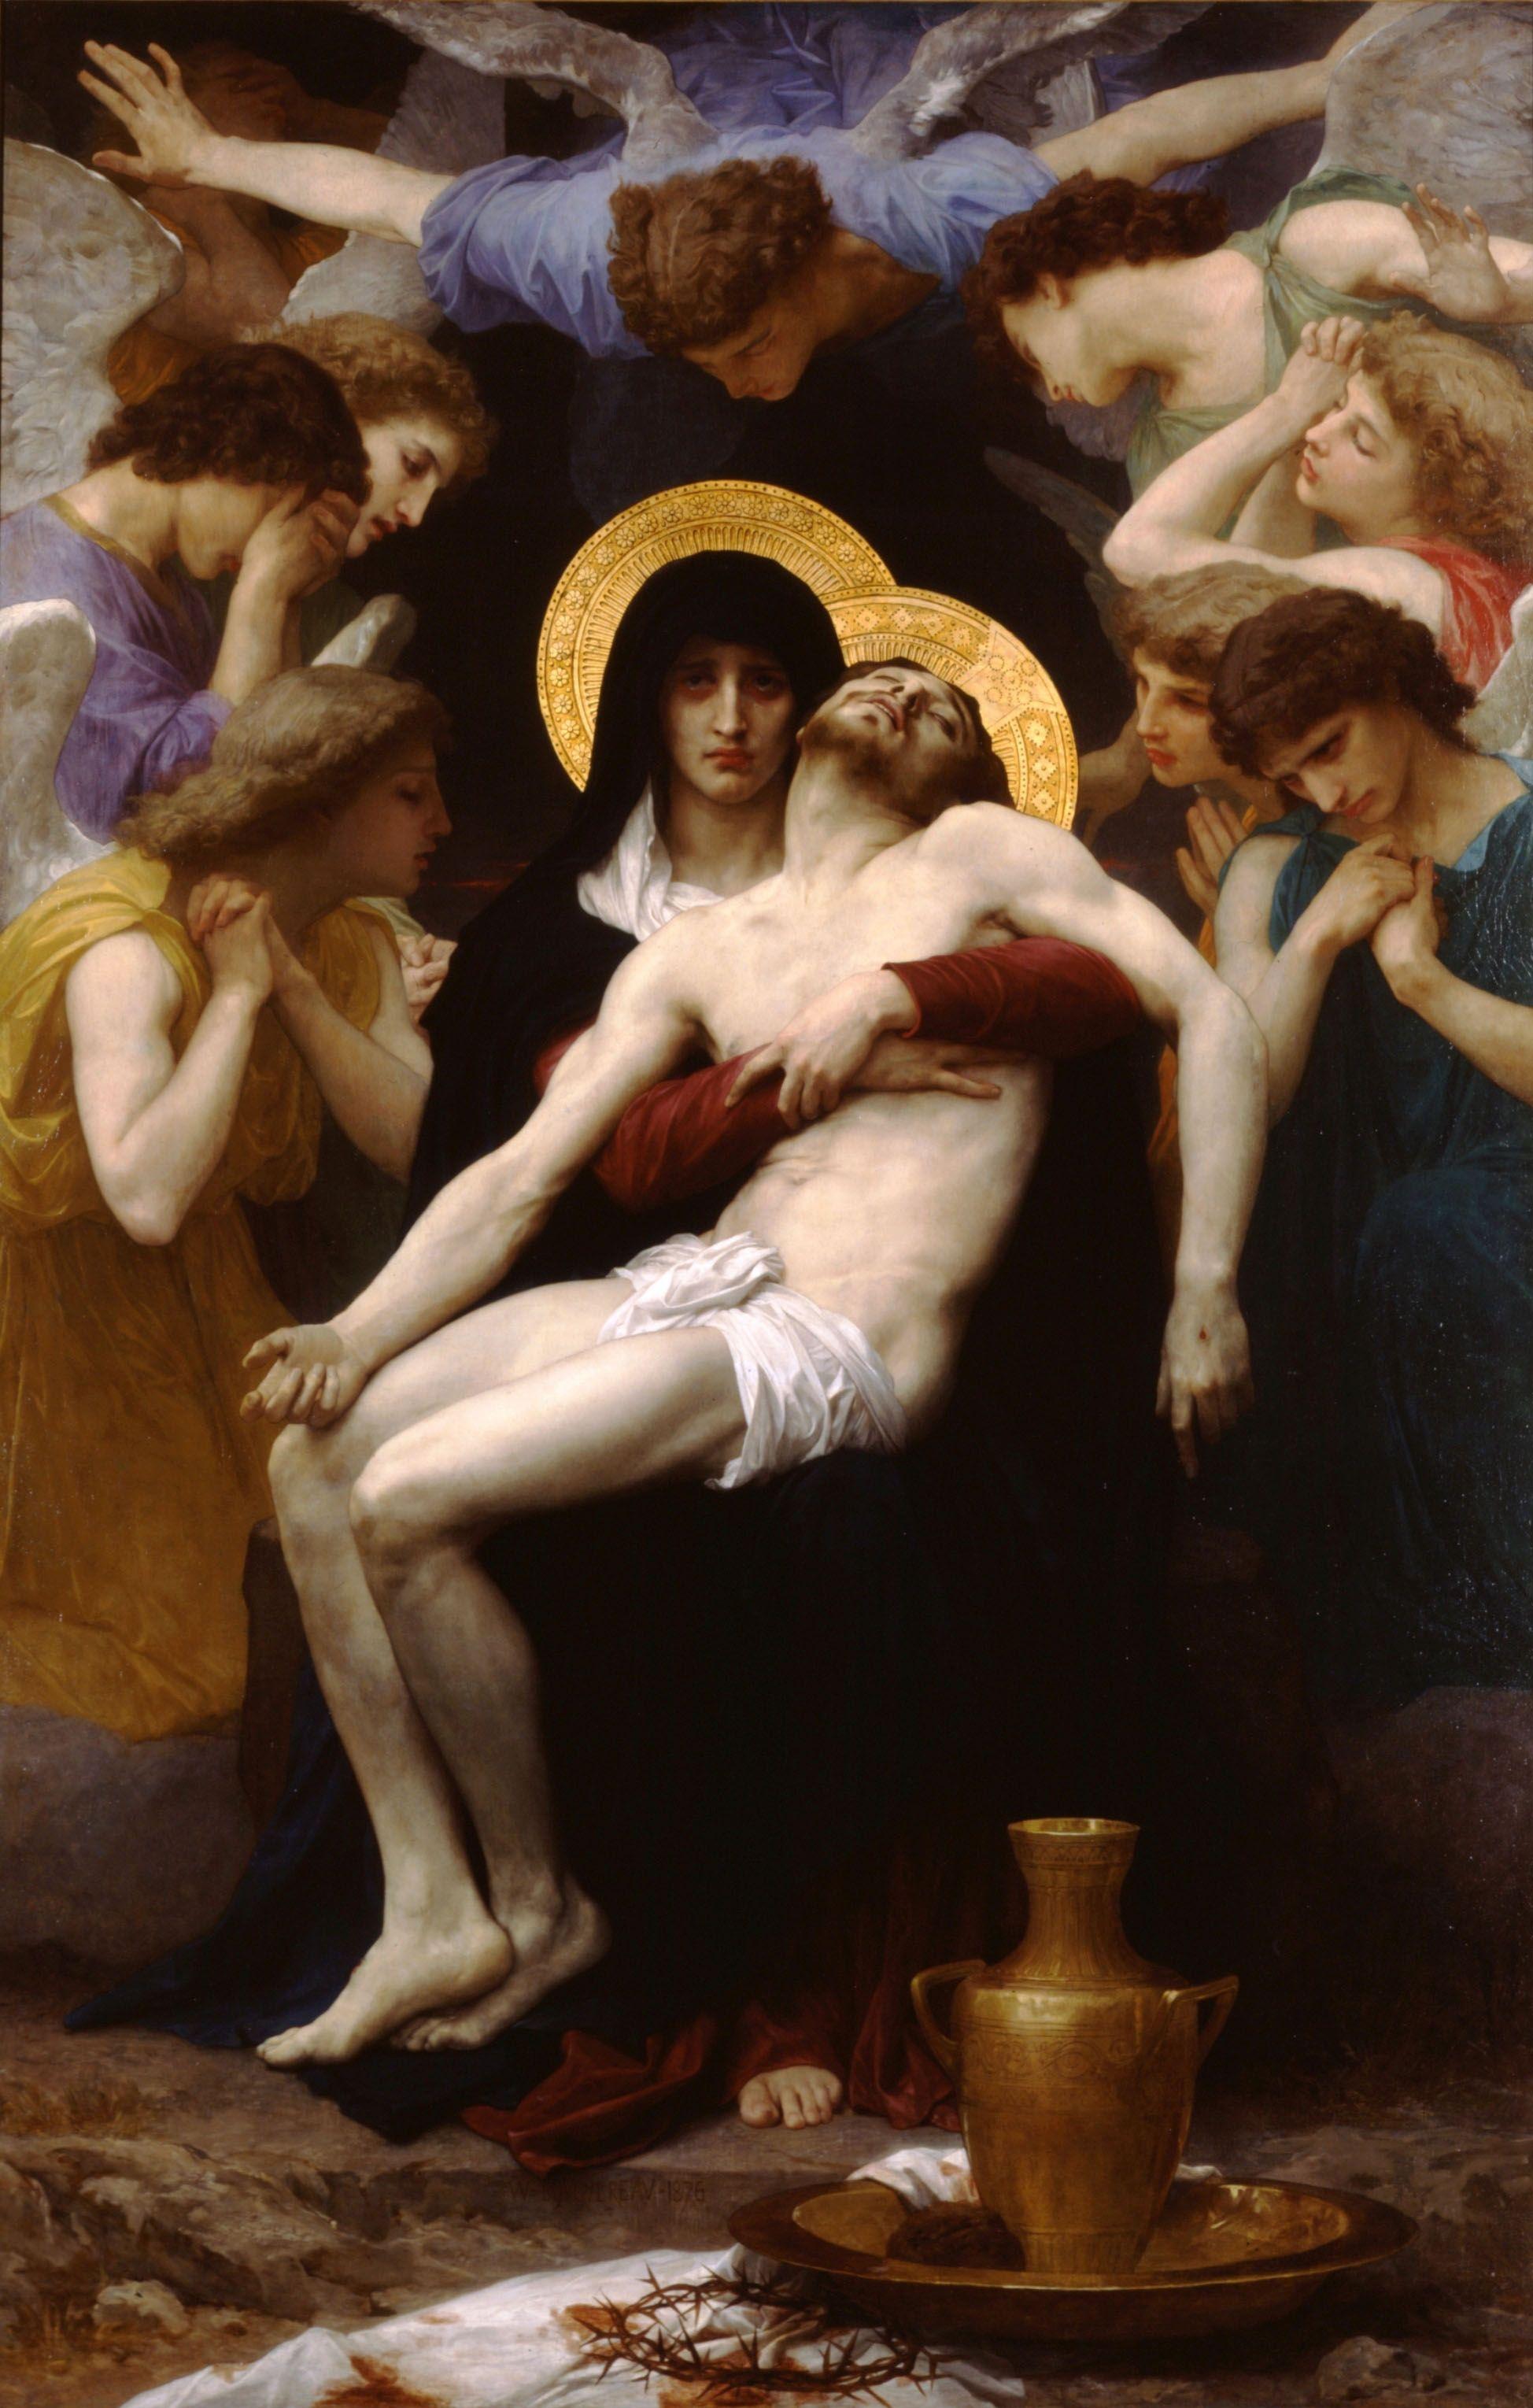 William Bouguereau (1825-1905) Pietа